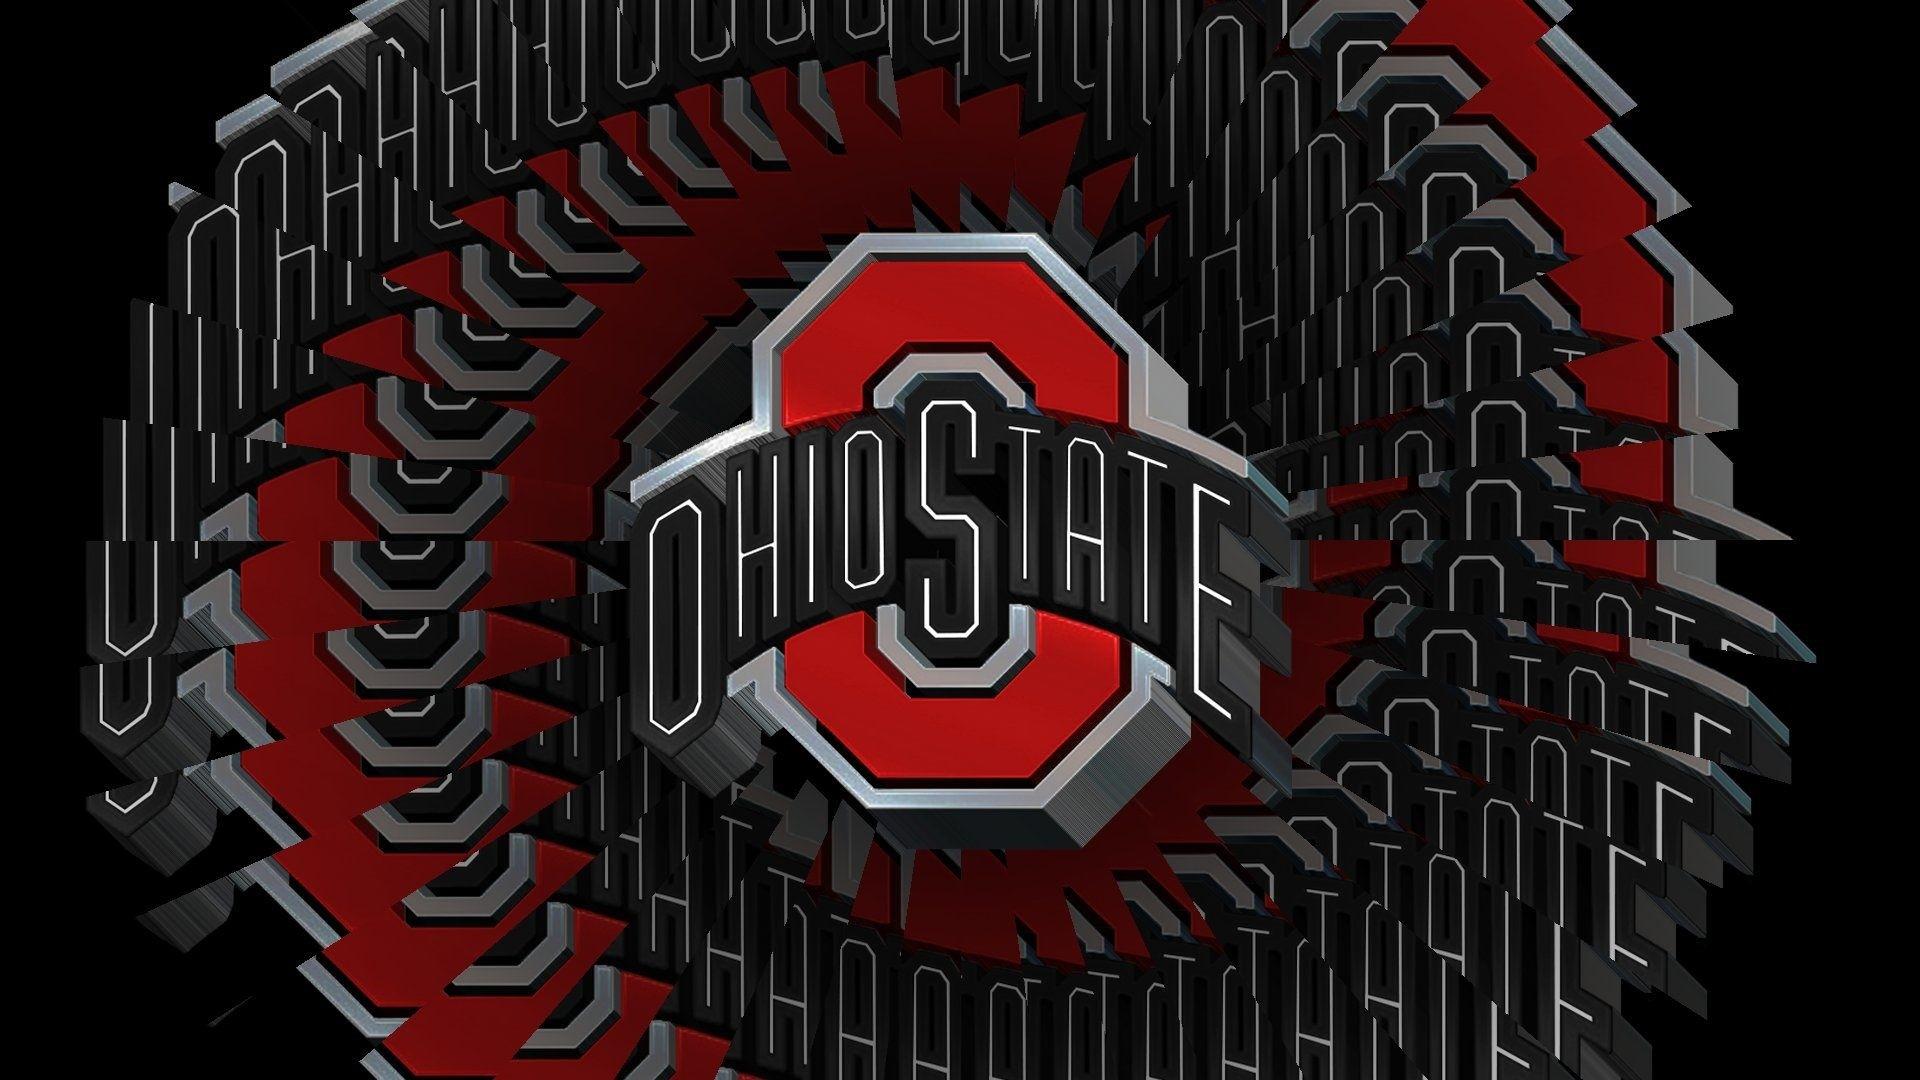 Ohio State Free Wallpaper